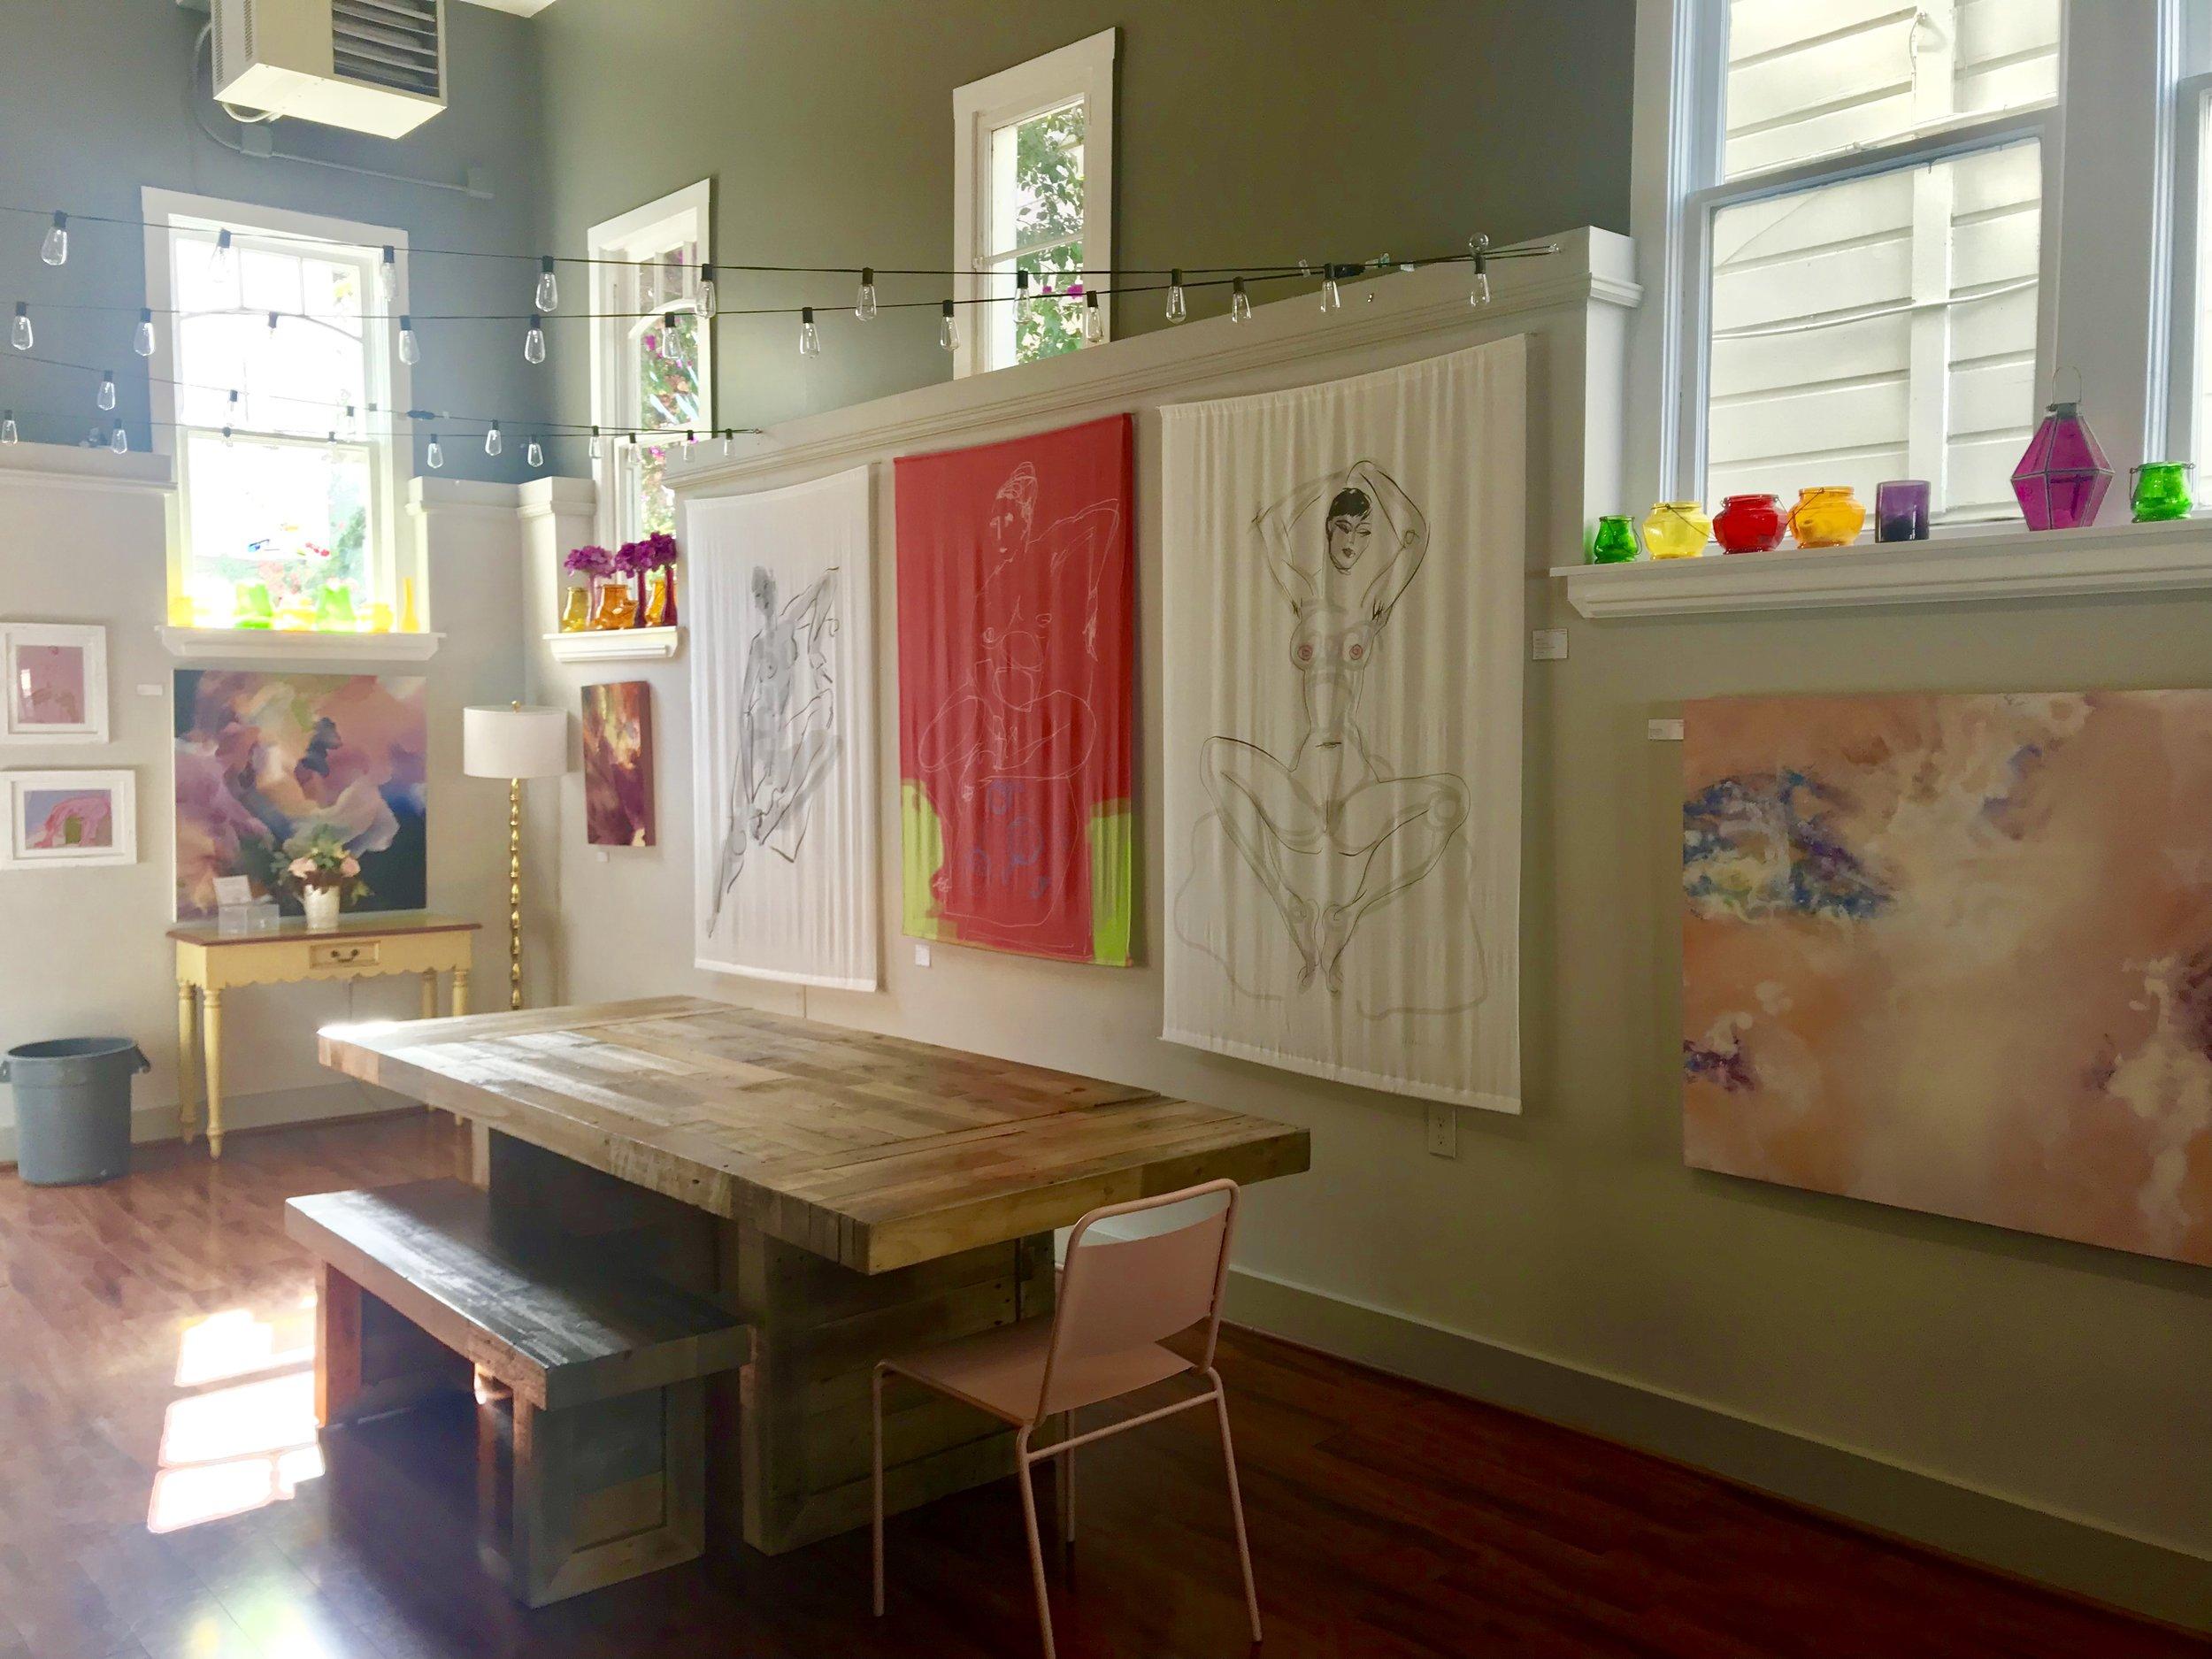 October 2018 at Spark Arts Gallery